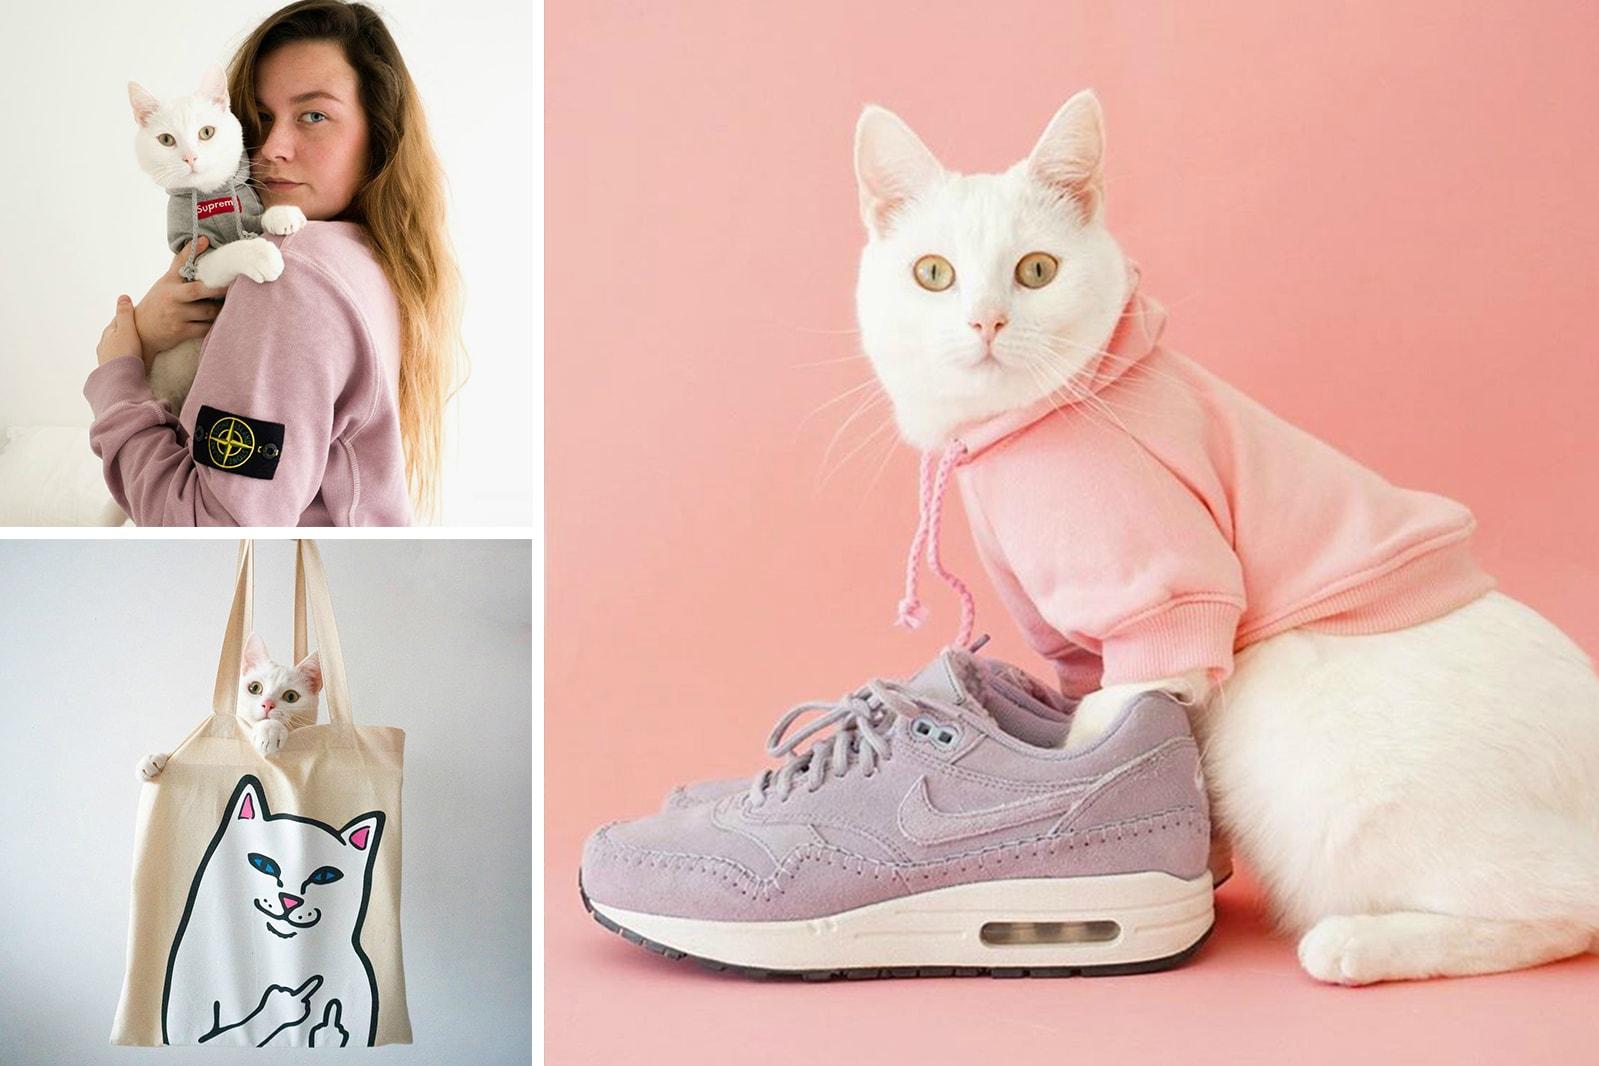 HYPEBAE Favorite Instagram Yuka Mannami Zappa the Cat Violette Cecy Young